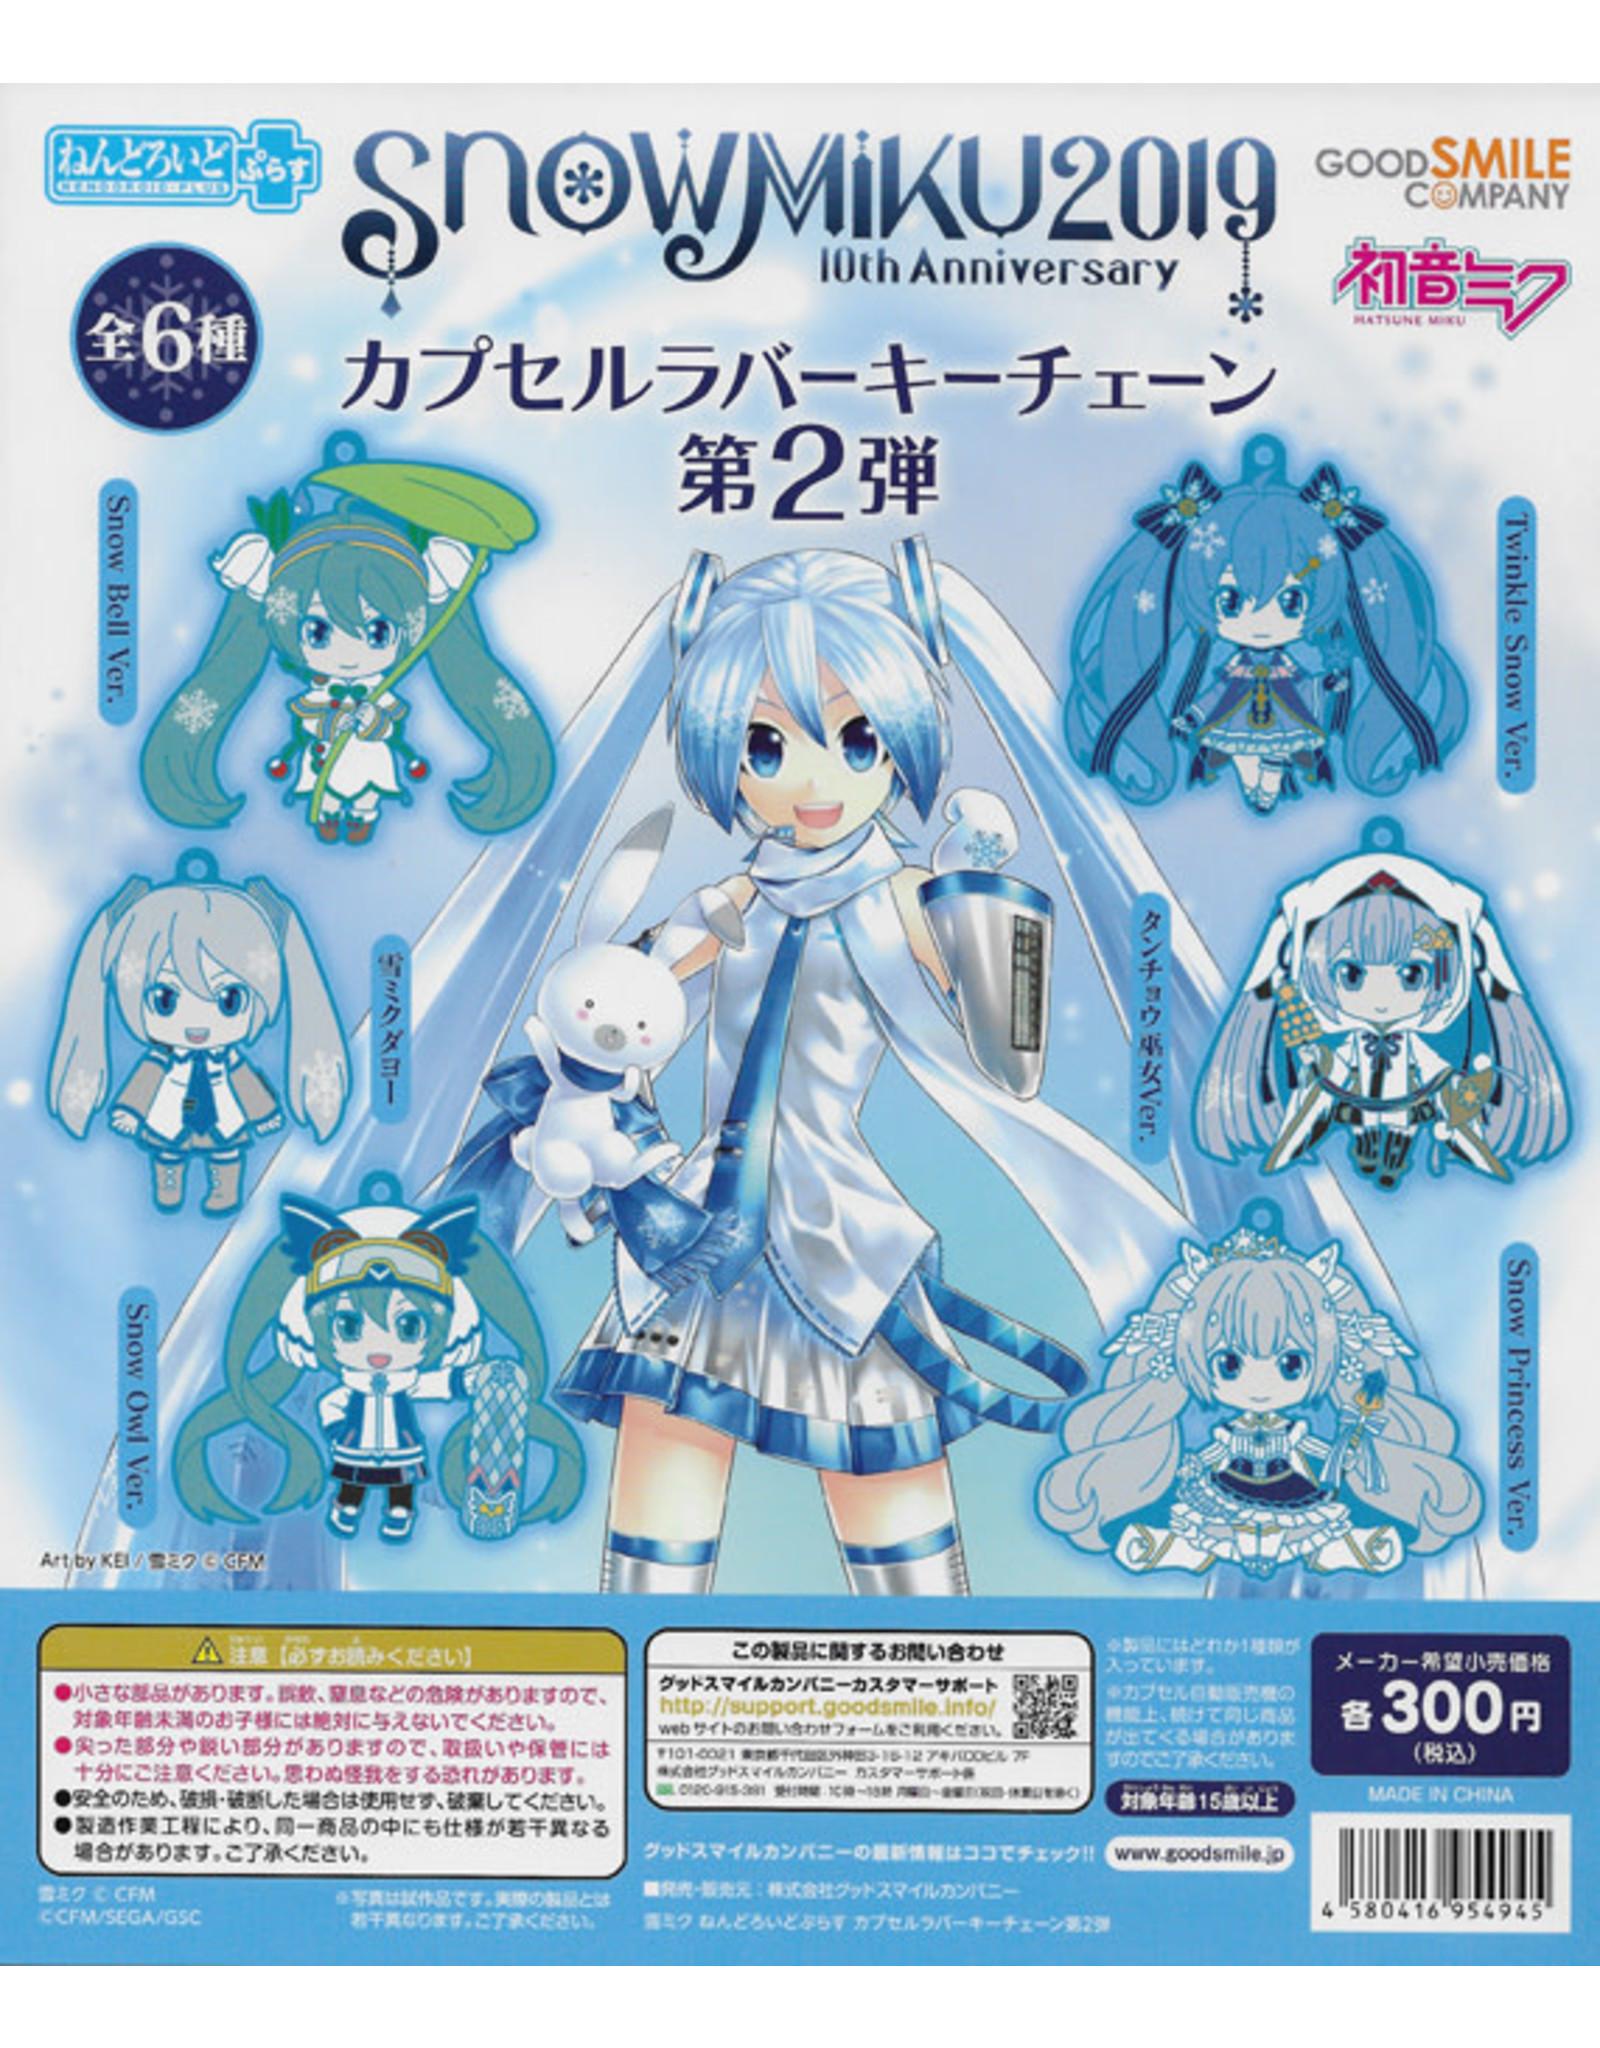 Hatsune Miku - Snow Miku 2019 10th Anniversary Capsule Rubber Keychain 2